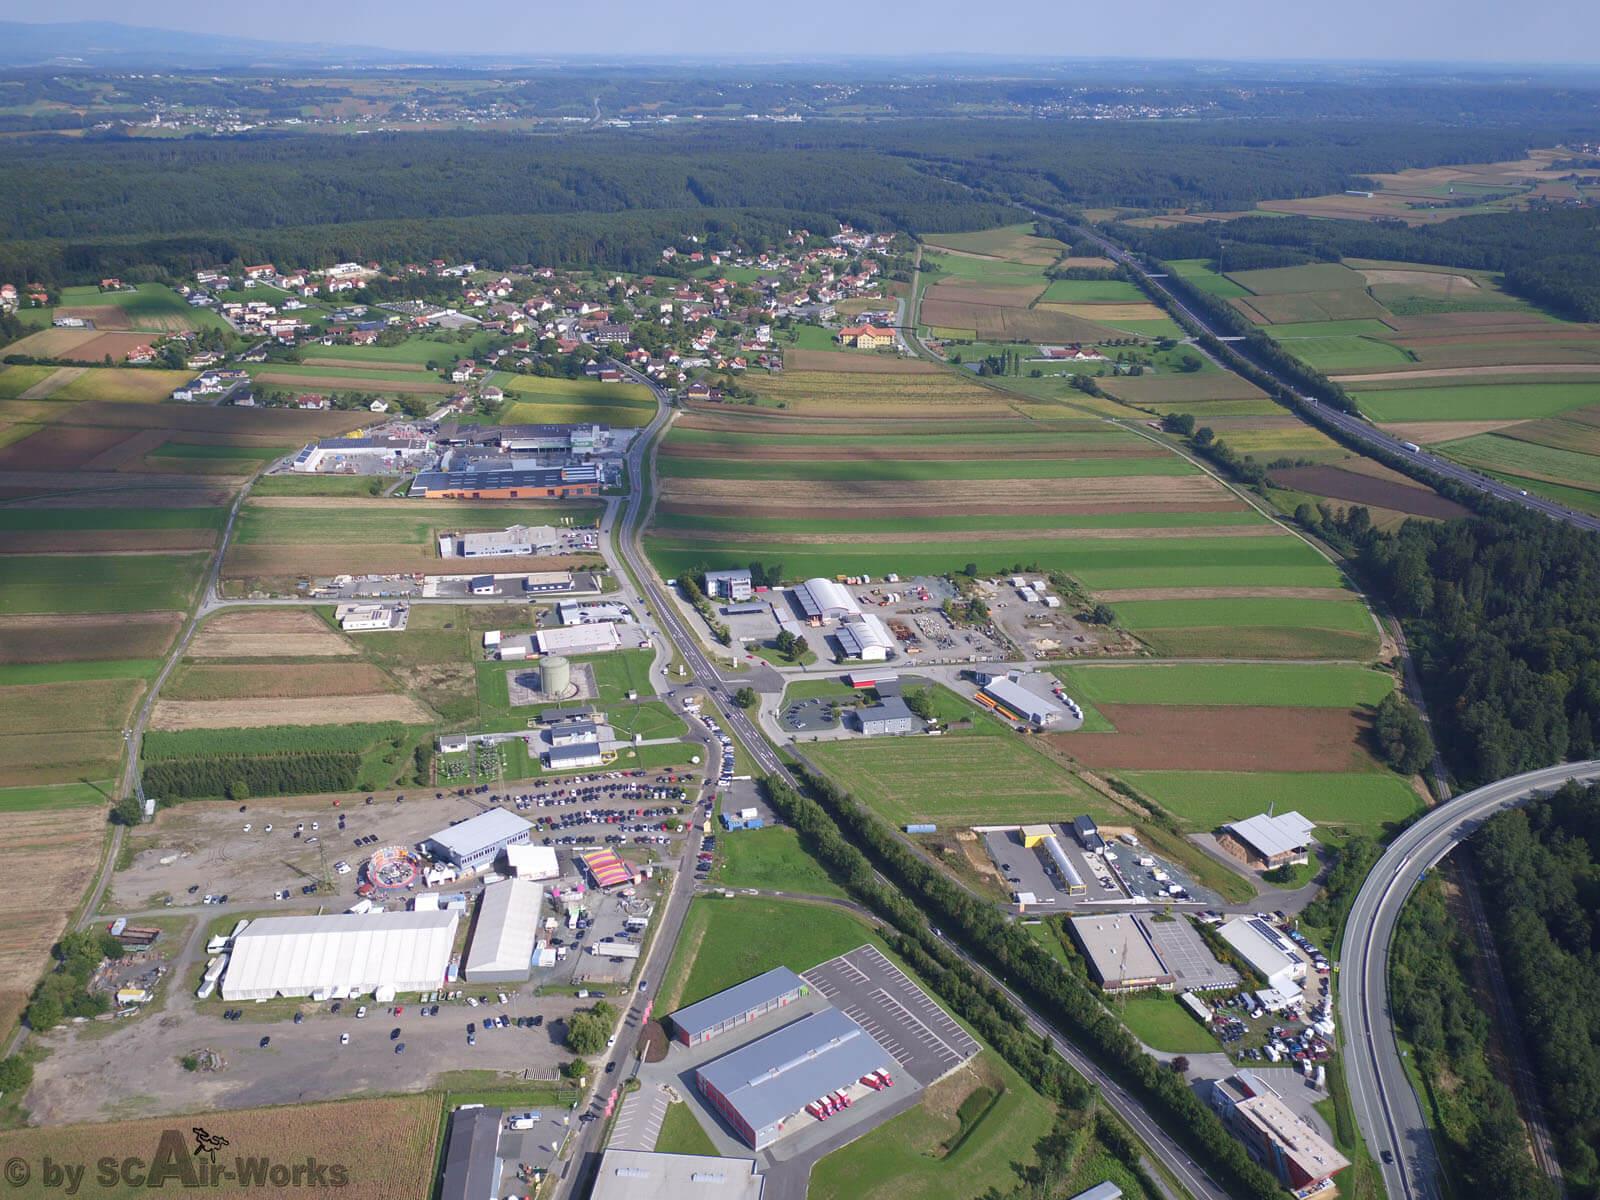 Gewerbegebiet St Johann